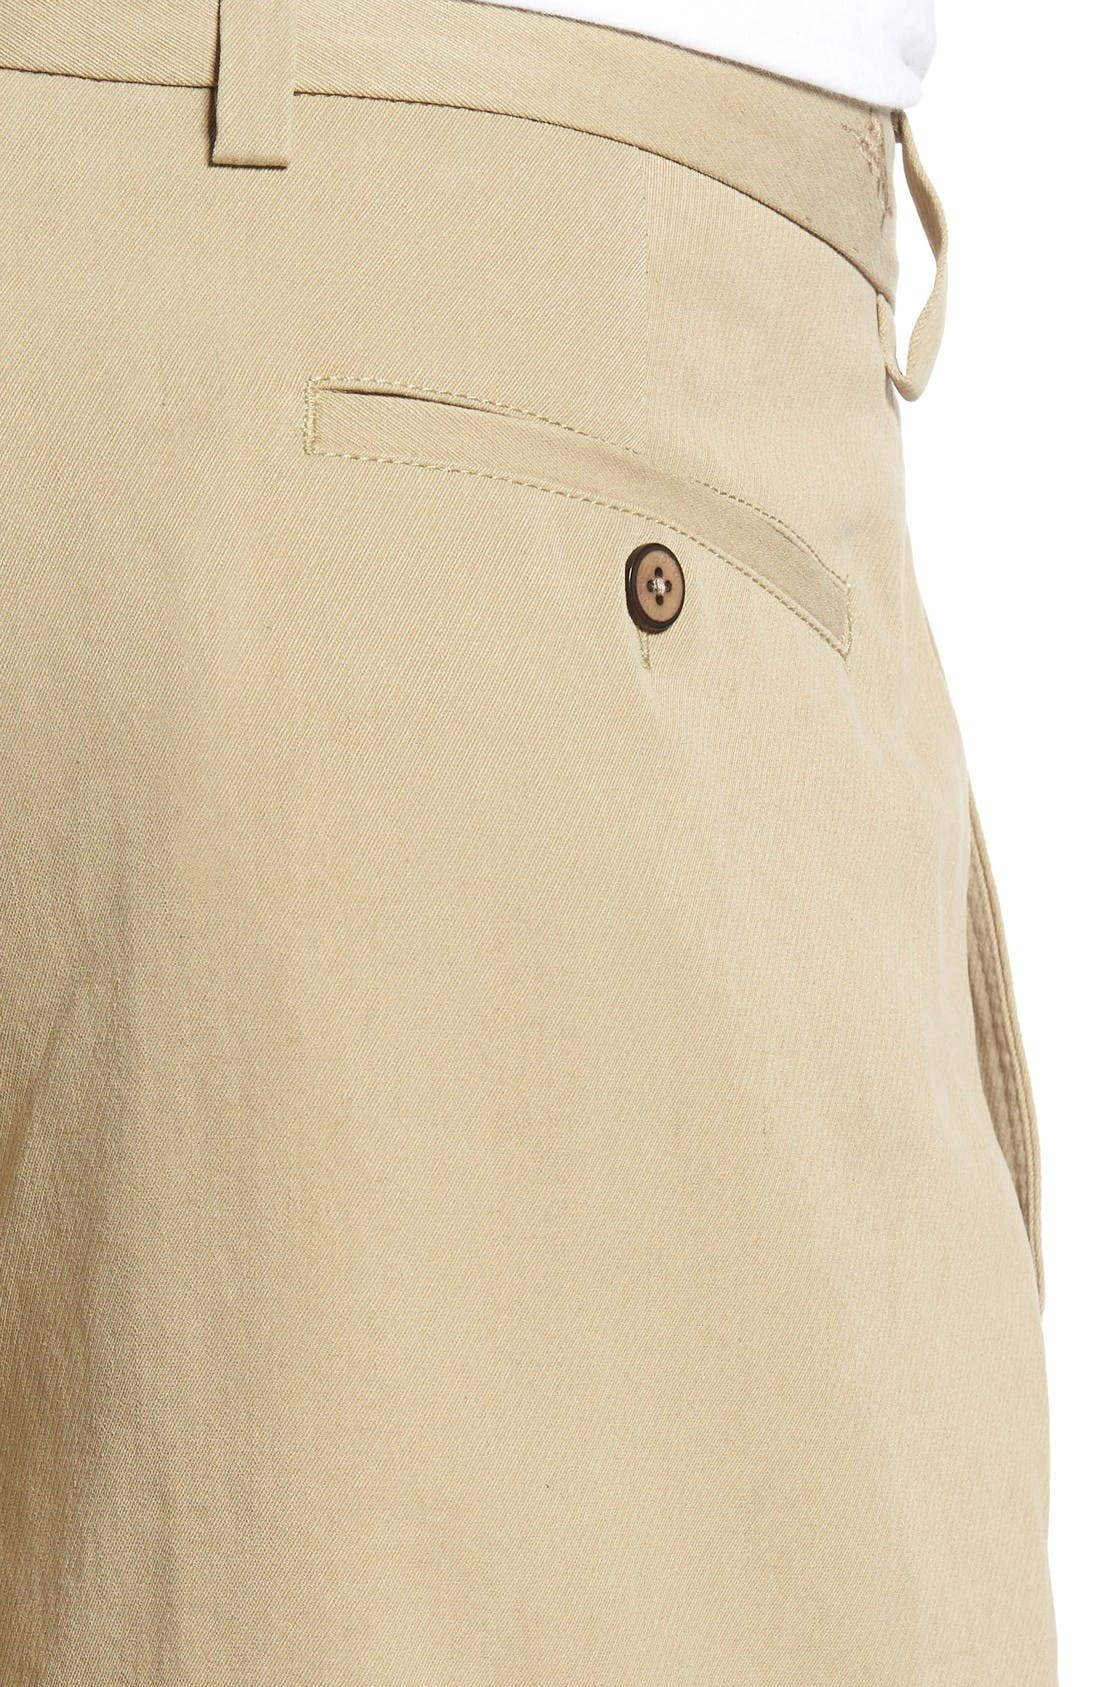 St. Thomas Pleated Shorts,                             Alternate thumbnail 4, color,                             Sisal